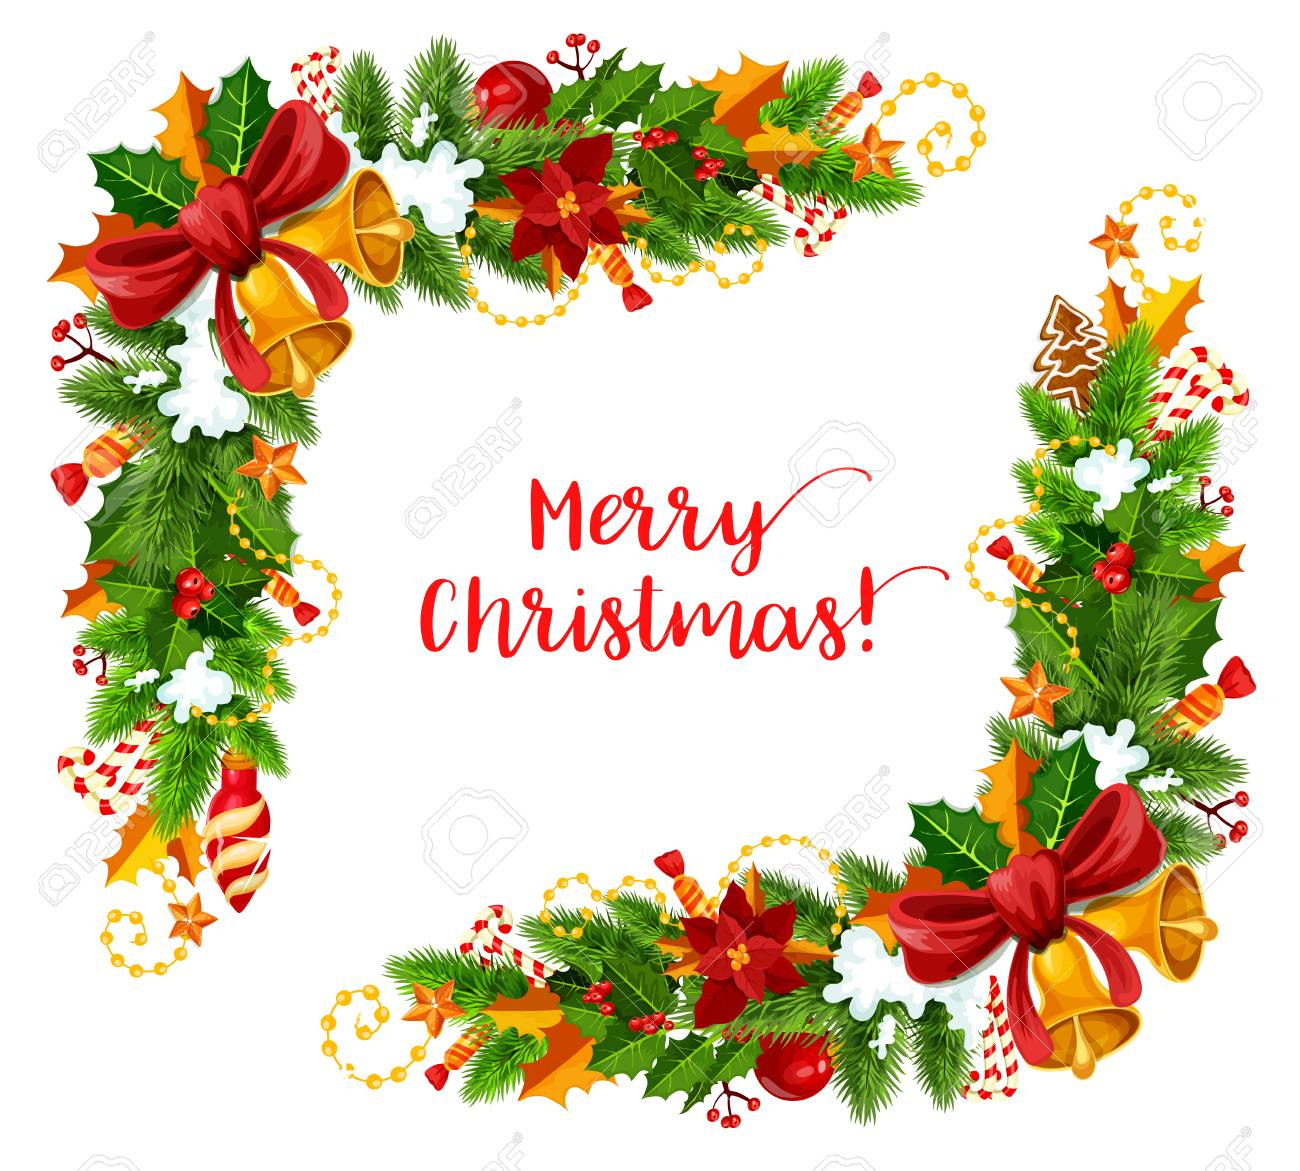 Christmas Frame Corner Of Christmas Tree And Holly Garland For